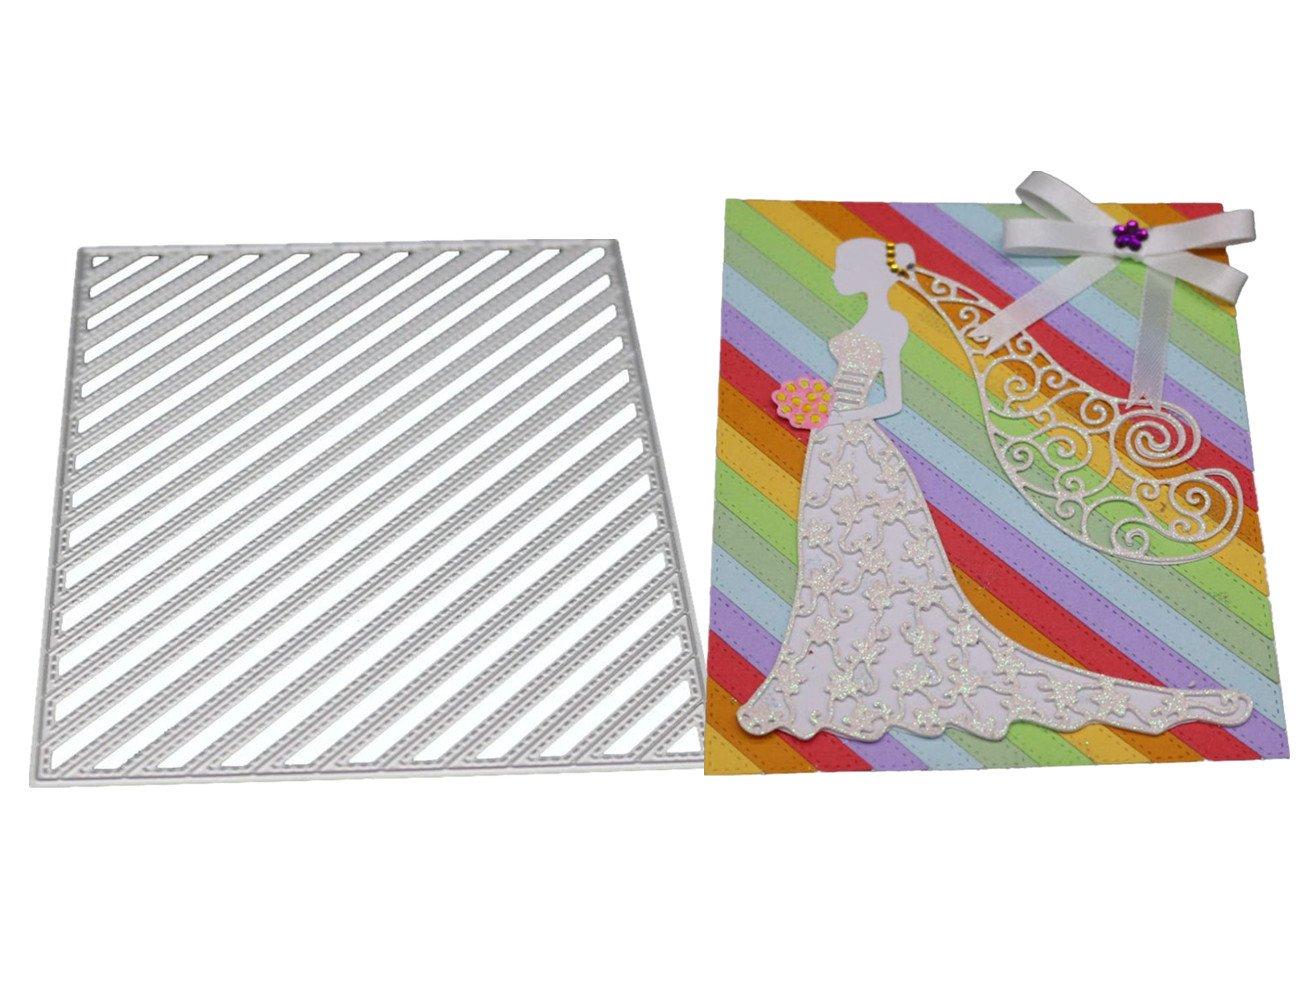 FNKDOR Fustelle per Scrapbooking Metallo Fustella Stencil Carta Cutting Dies DIY Album Foto, Accessori per Big Shot e altre macchina (A)